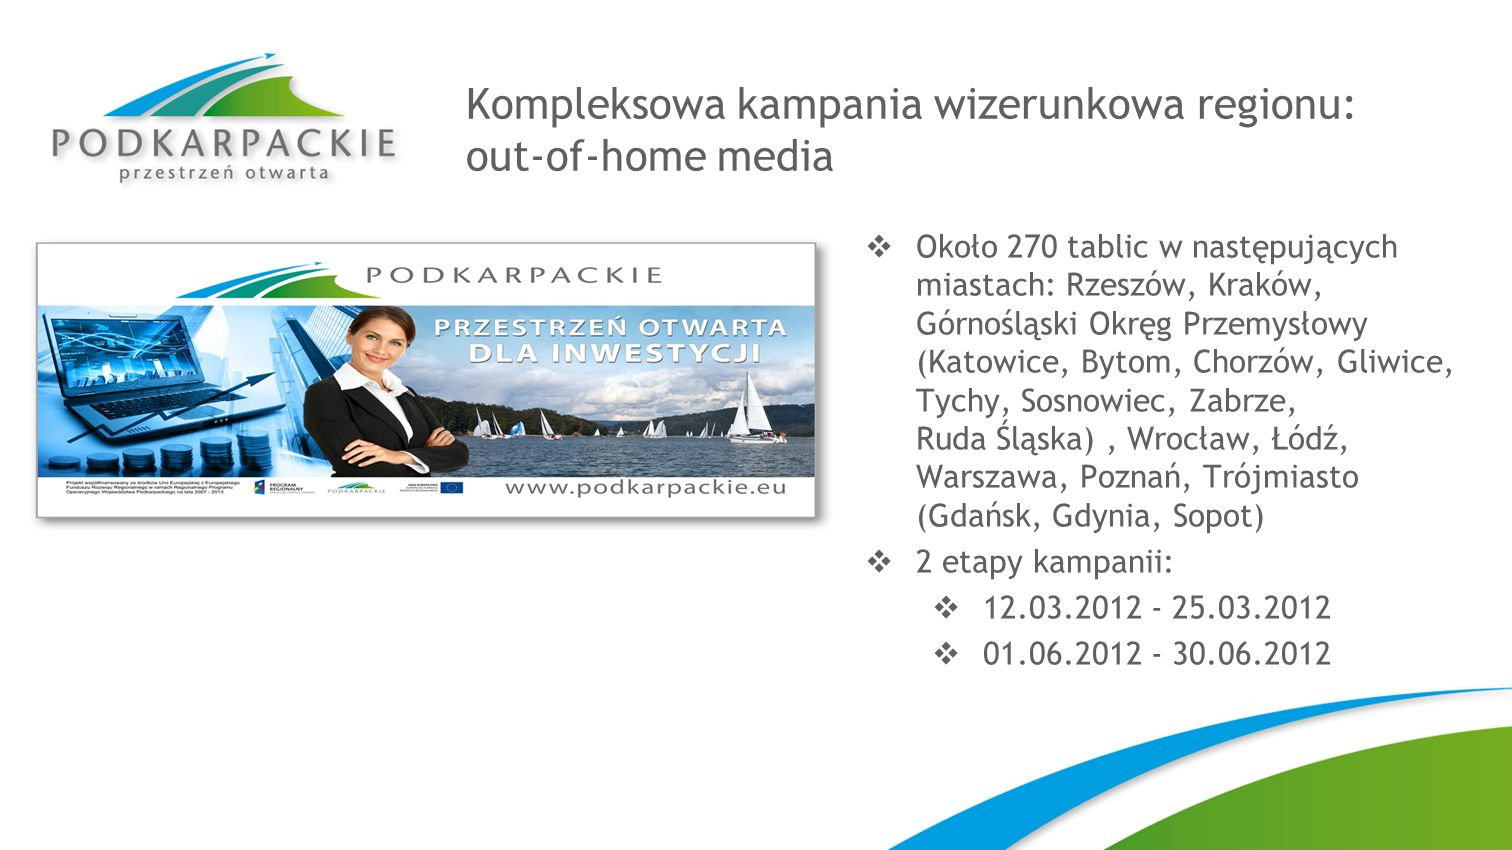 Kompleksowa kampania wizerunkowa regionu: out-of-home media